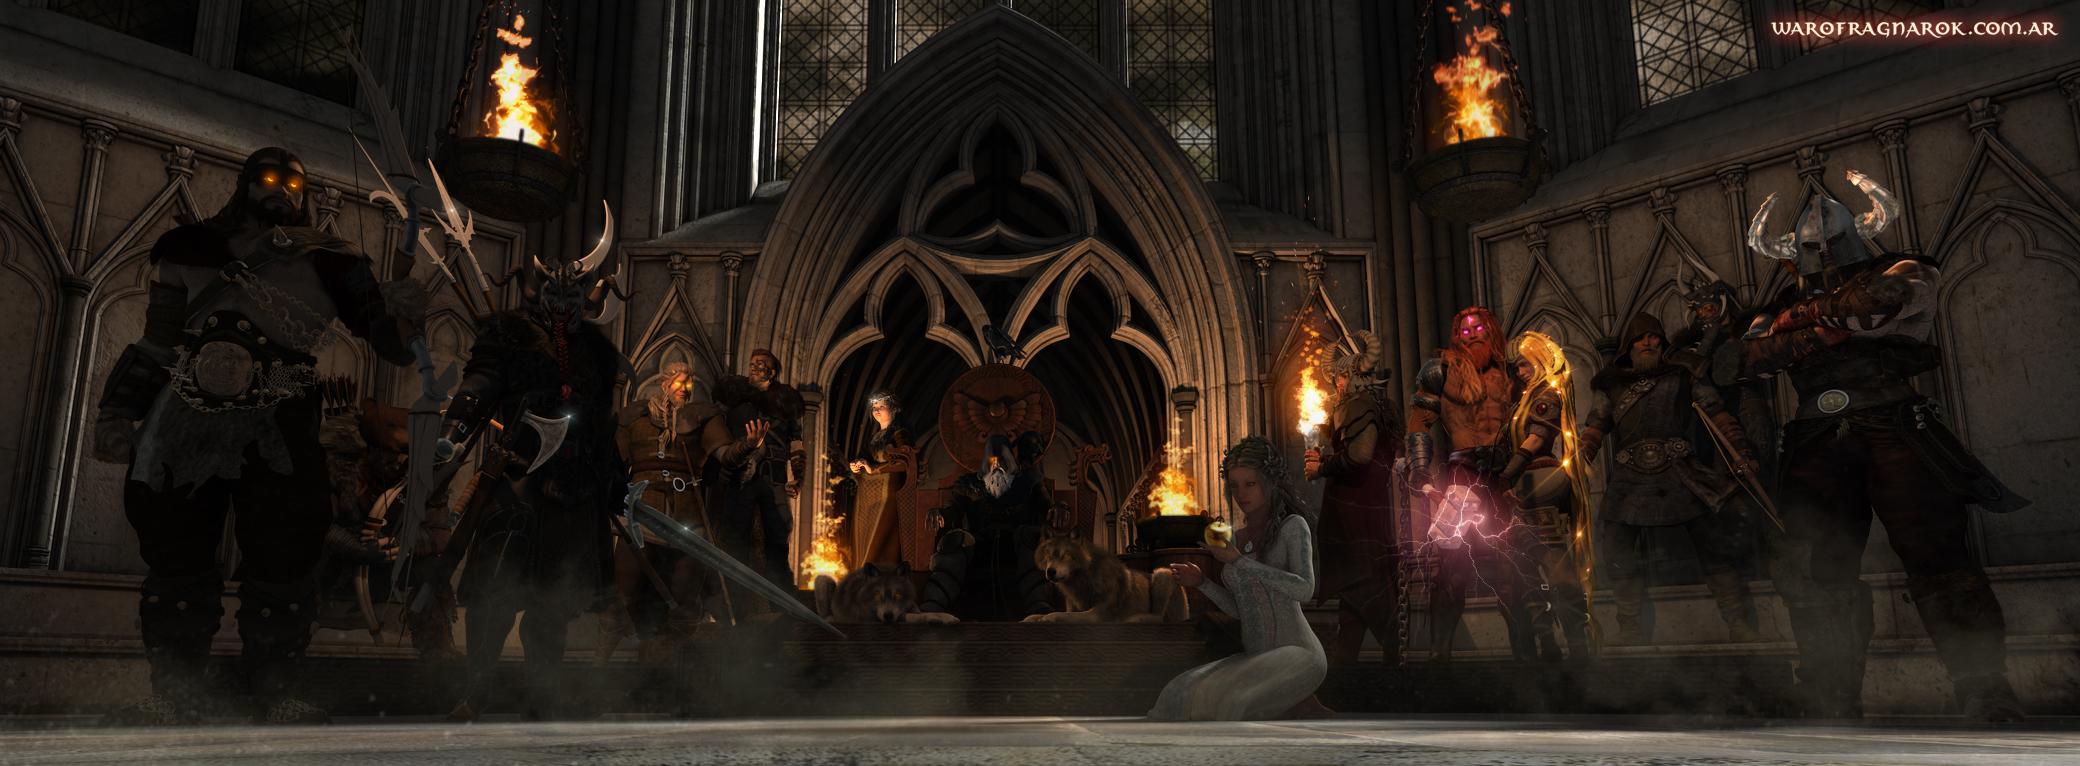 Gods of Asgard by warofragnarok